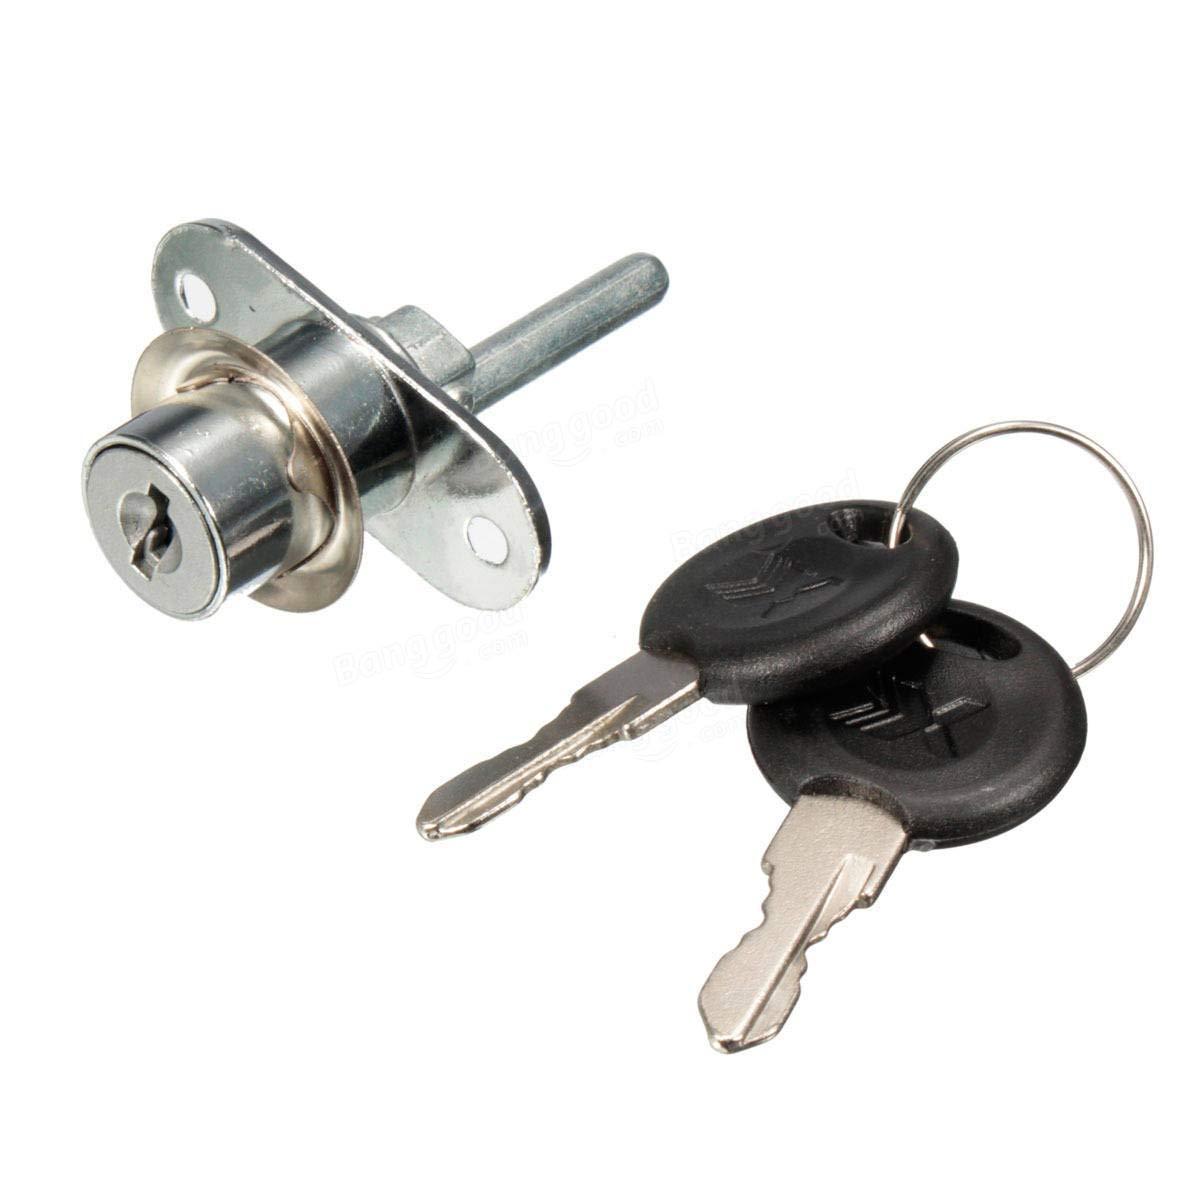 Hardware & Accessories Door Hardware & Locks - Aluminium Alloy Cam Lock For Cabinet Drawer Locker with 2 Keys 16mm - Chrome - 1 X 16mm Lock 2 X Keys